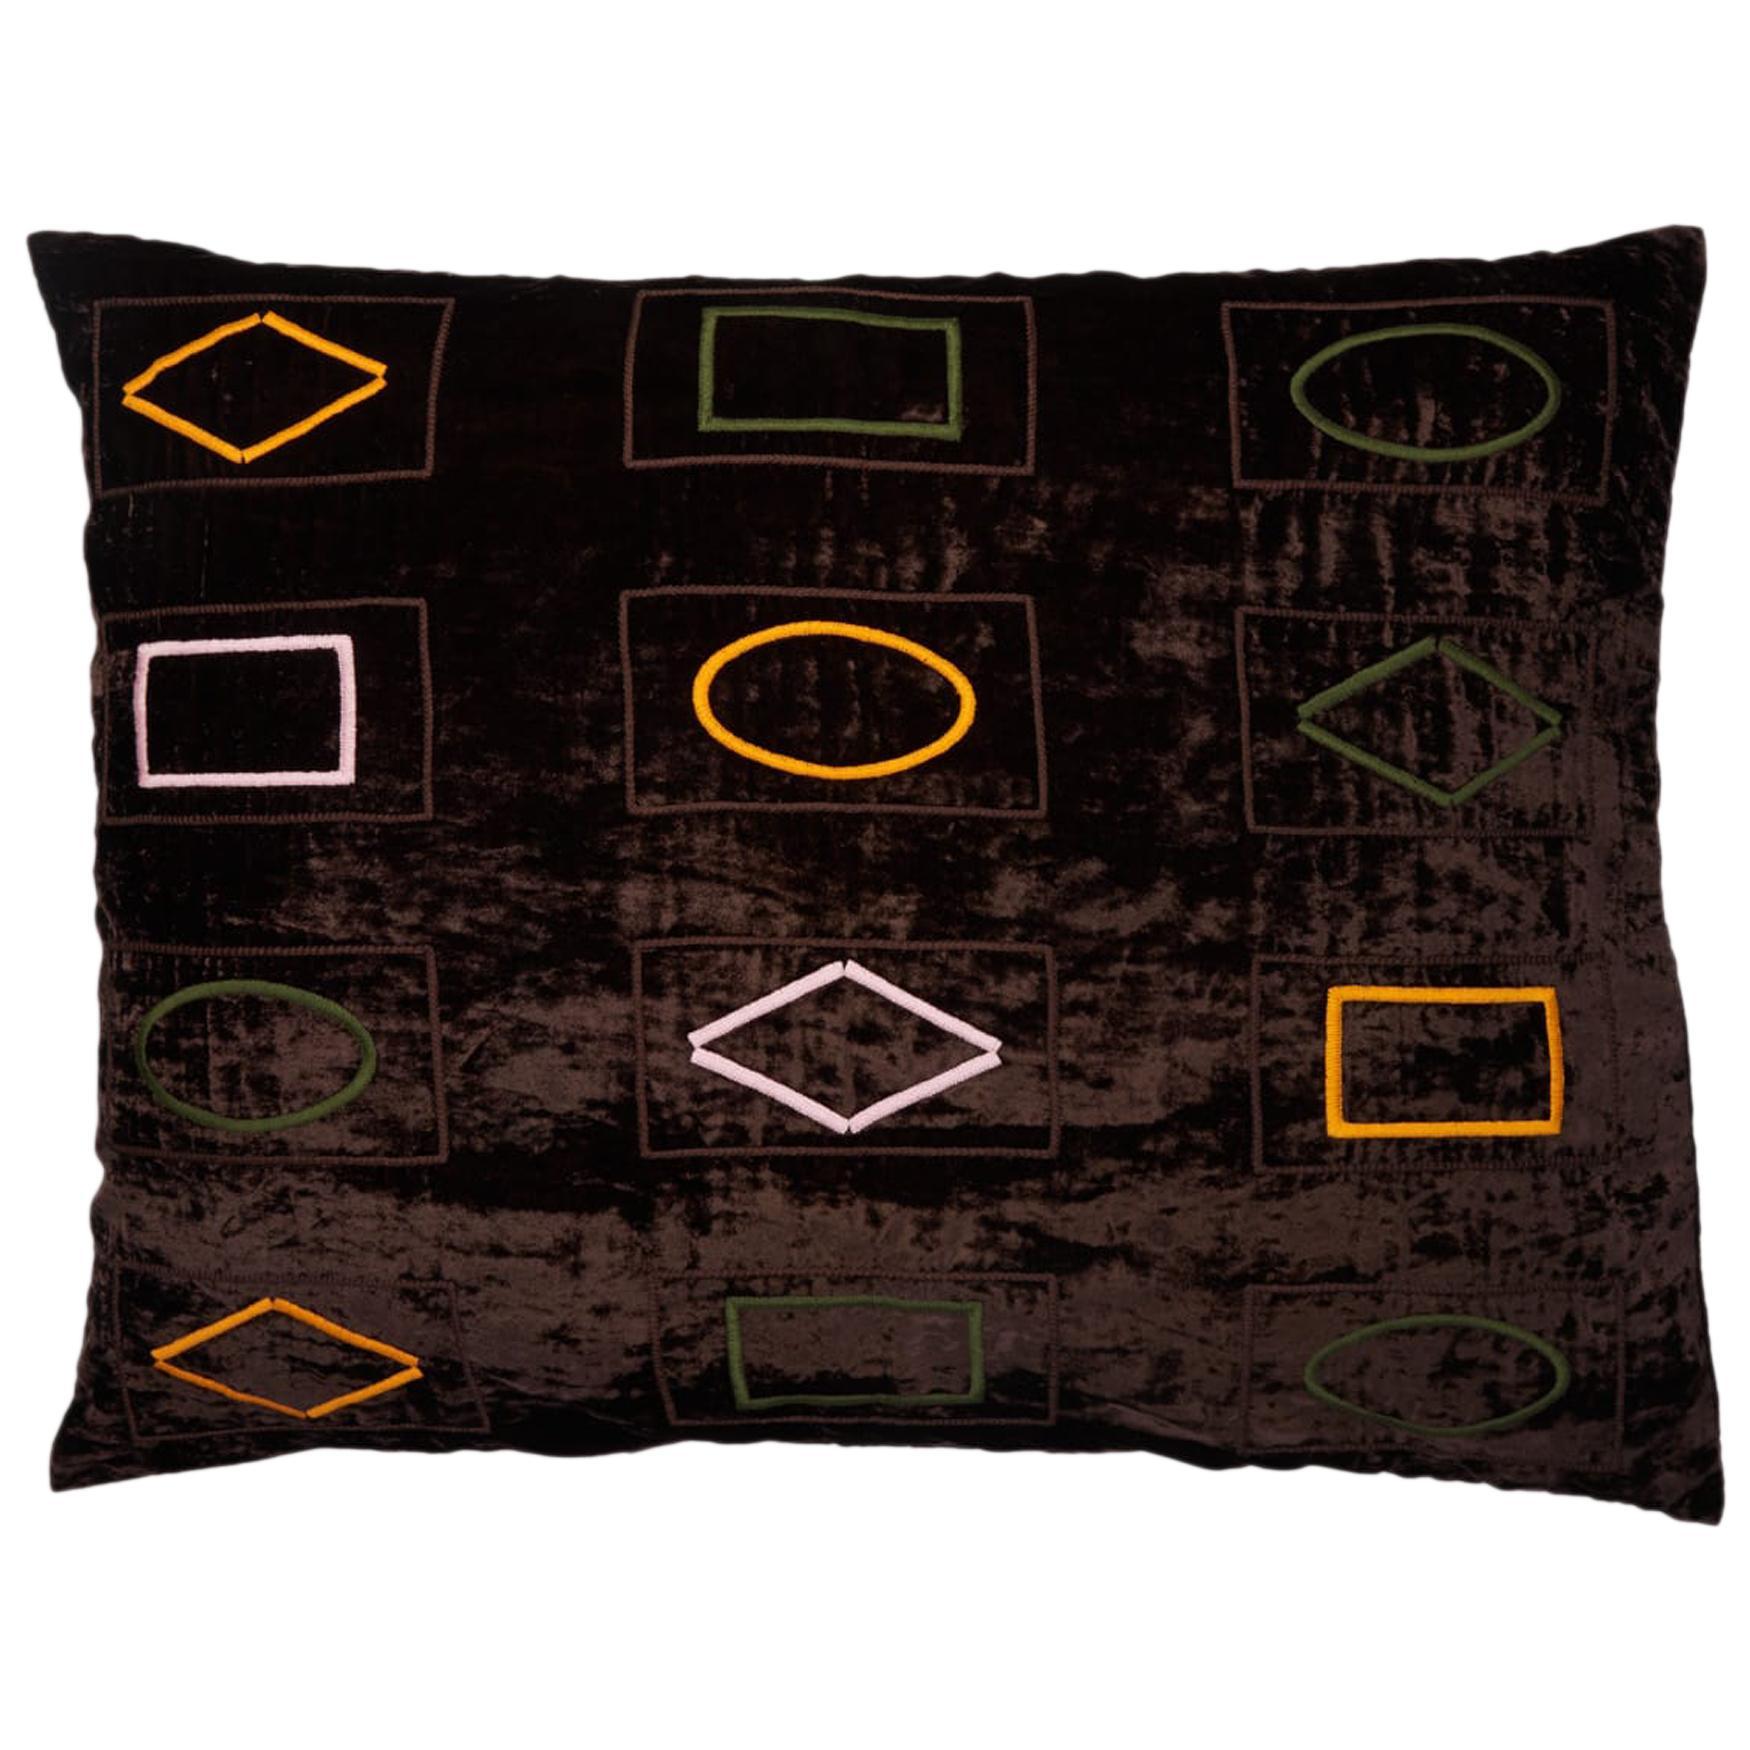 Barberton Hand Embroidered Brown Velvet Pillow Cover